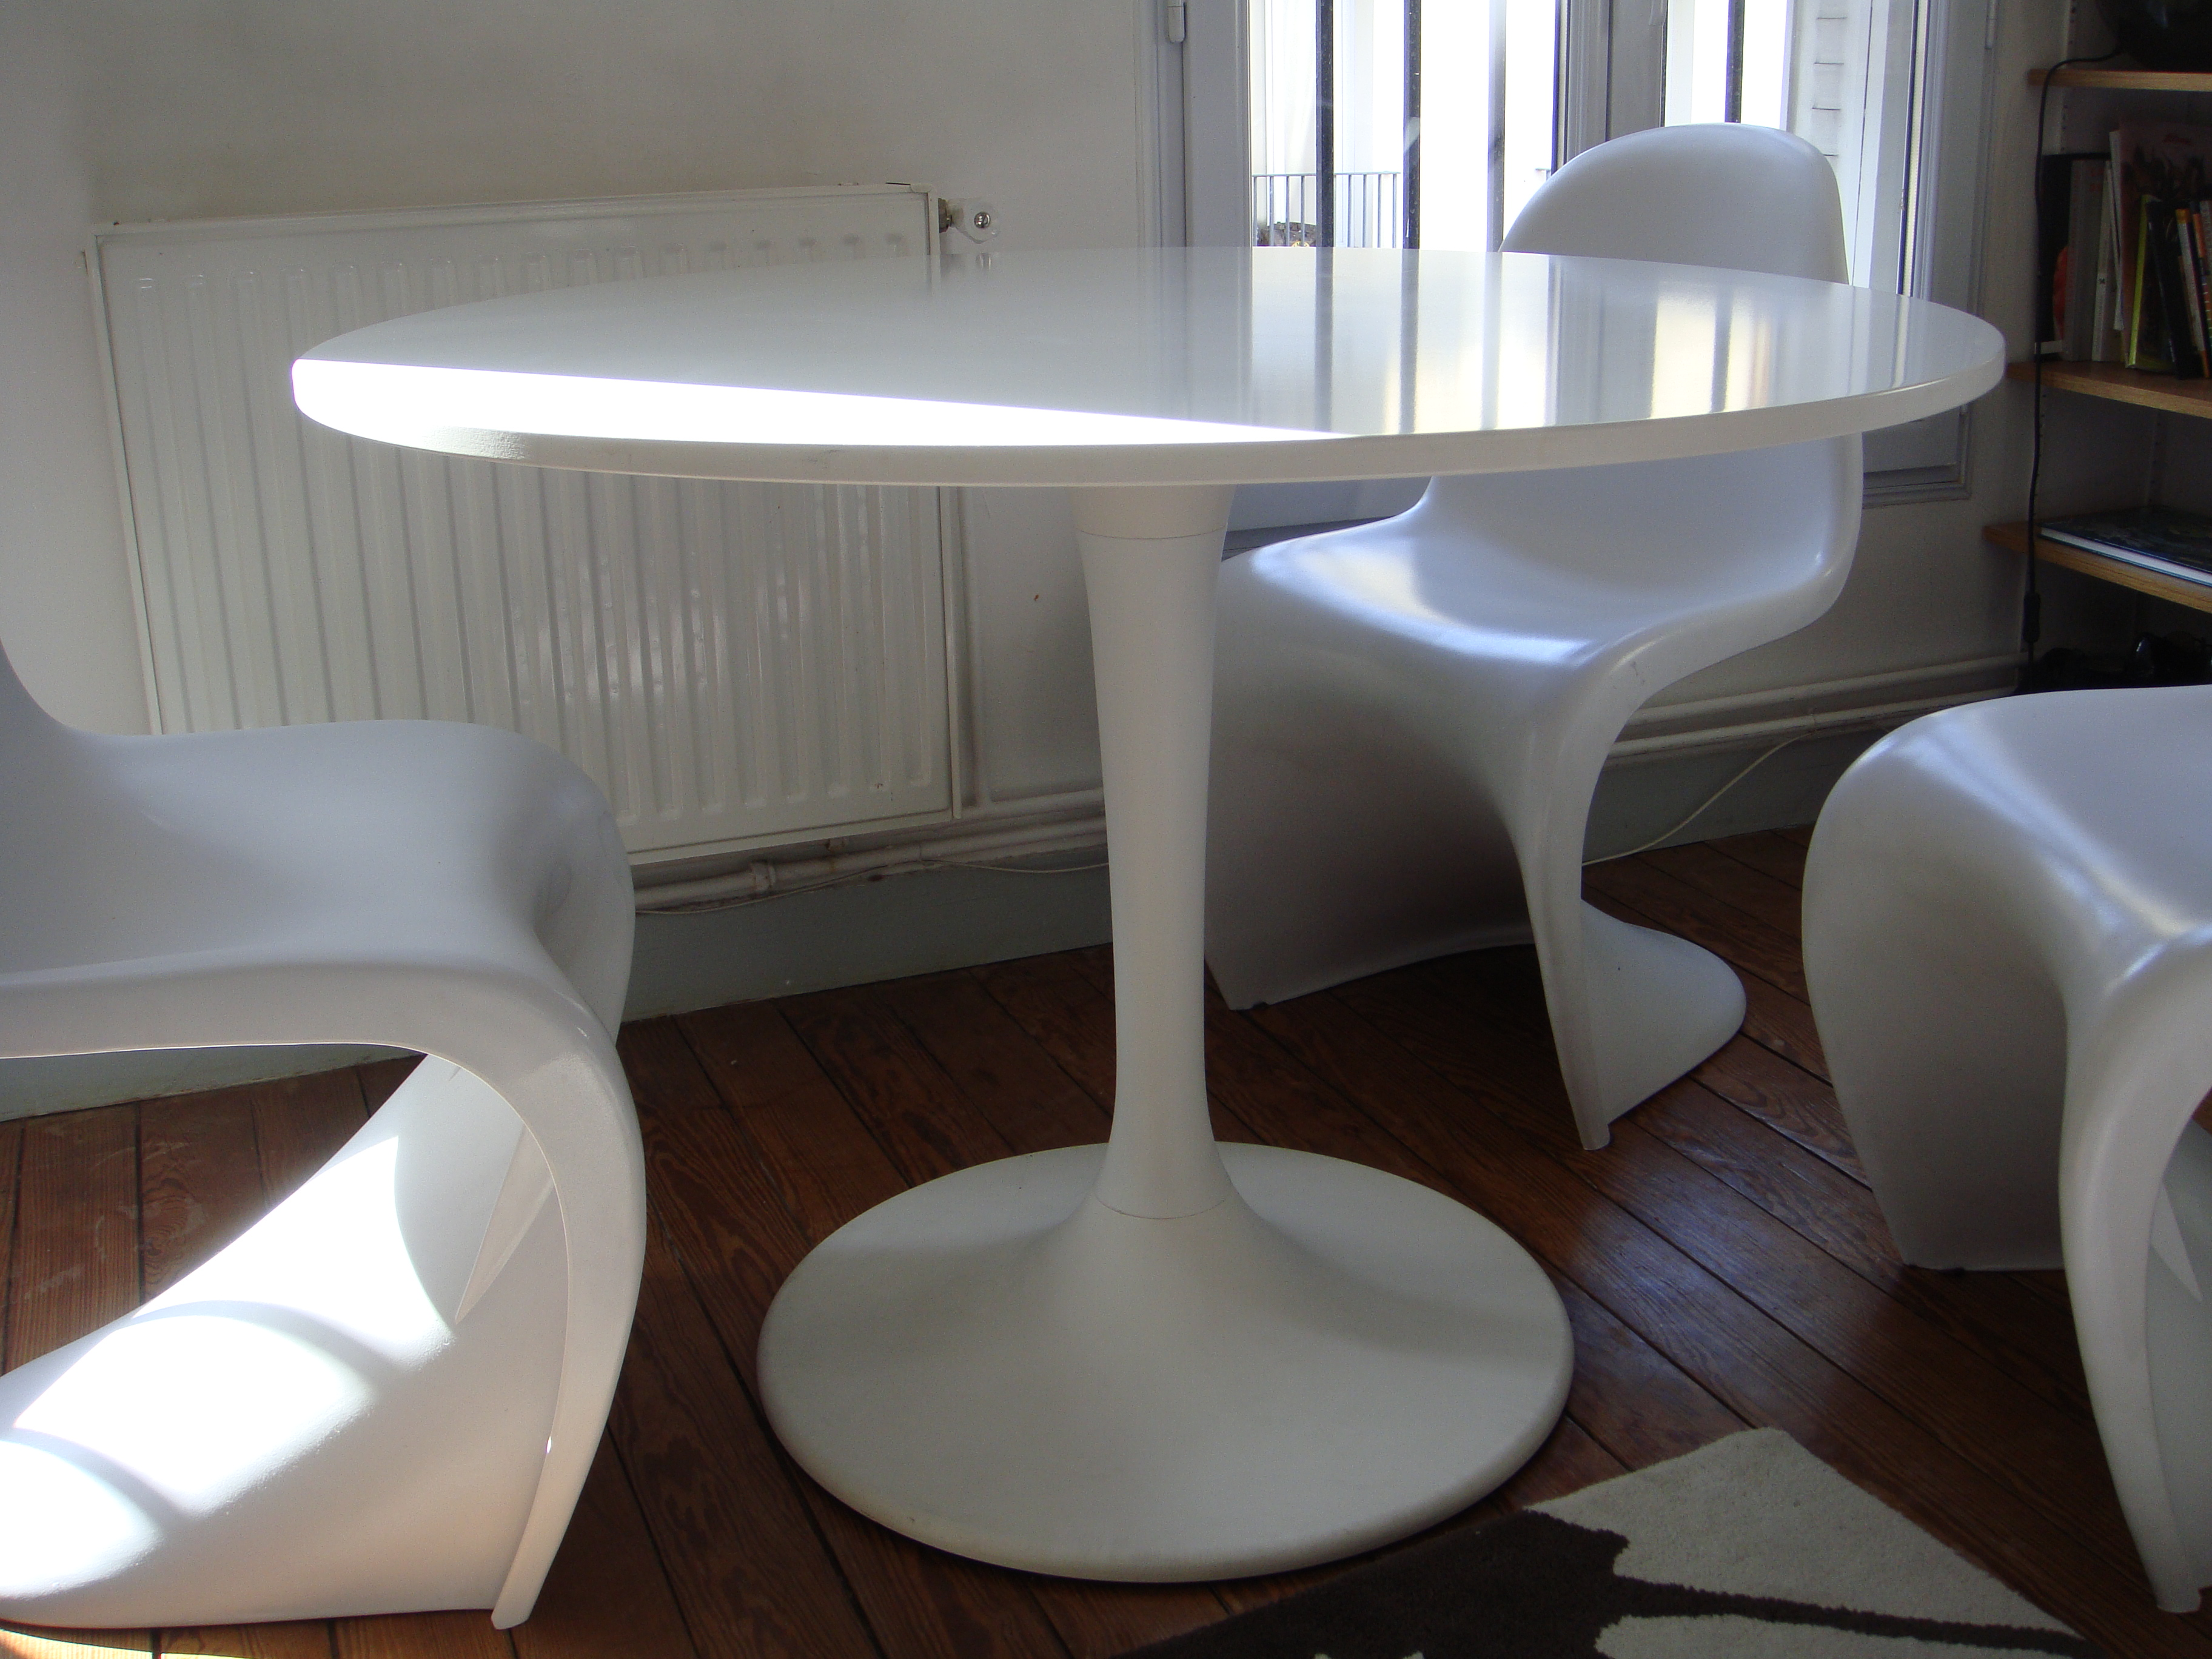 Table Ikea Docksta Je Vide Mon Appart